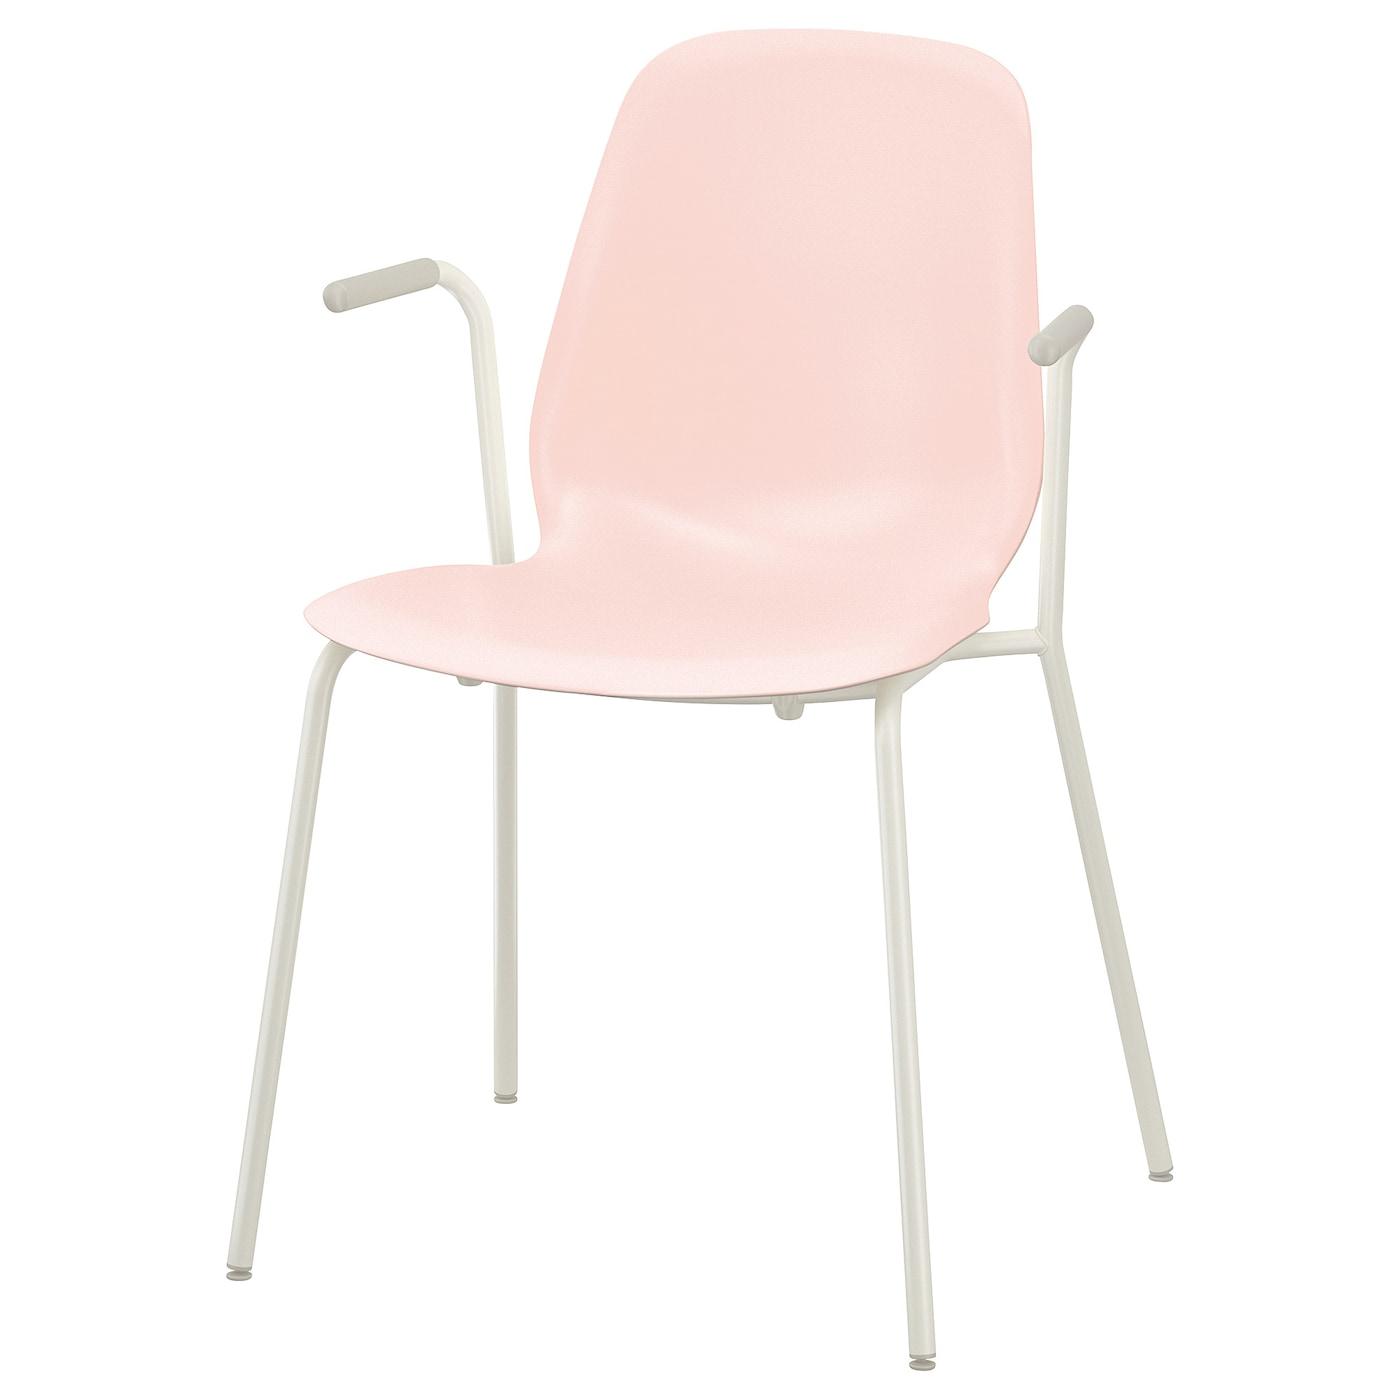 leifarne chaise accoudoirs rose dietmar blanc ikea. Black Bedroom Furniture Sets. Home Design Ideas